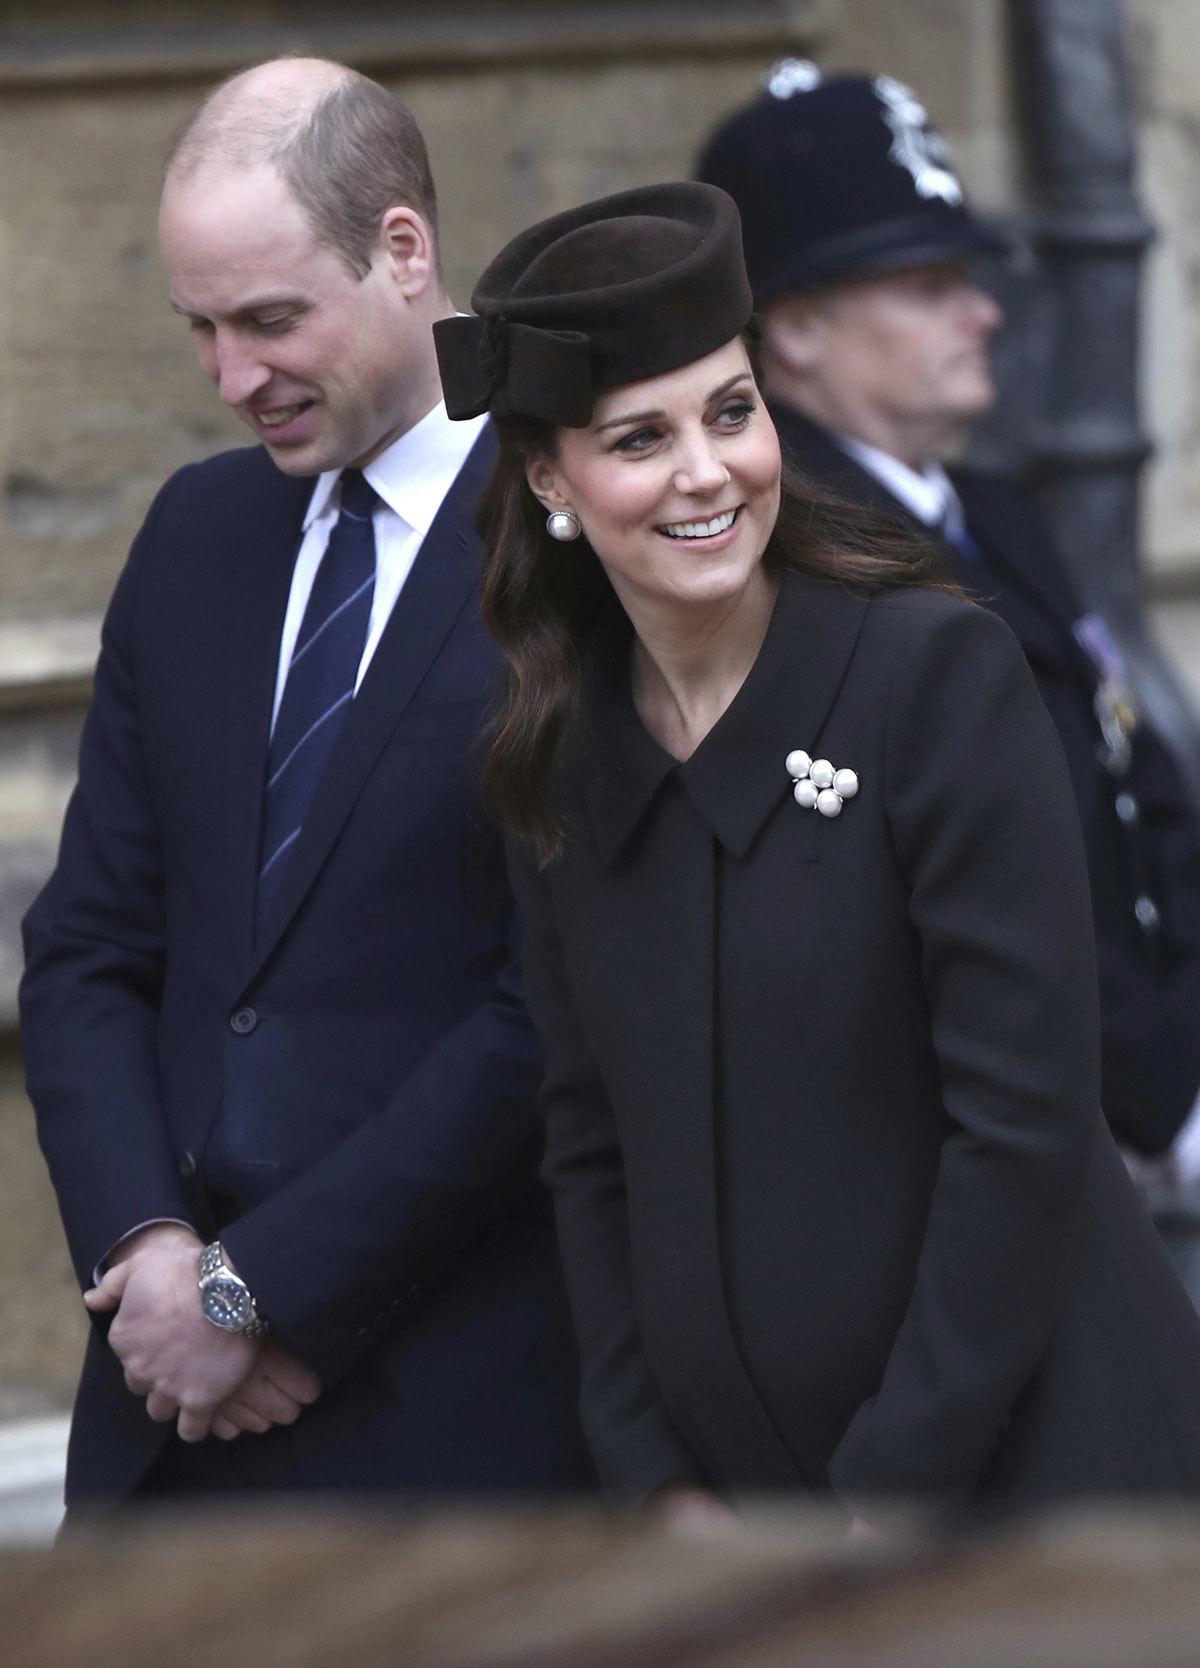 Kate Middleton ha dado a luz a su tercer hijo | Telva.com